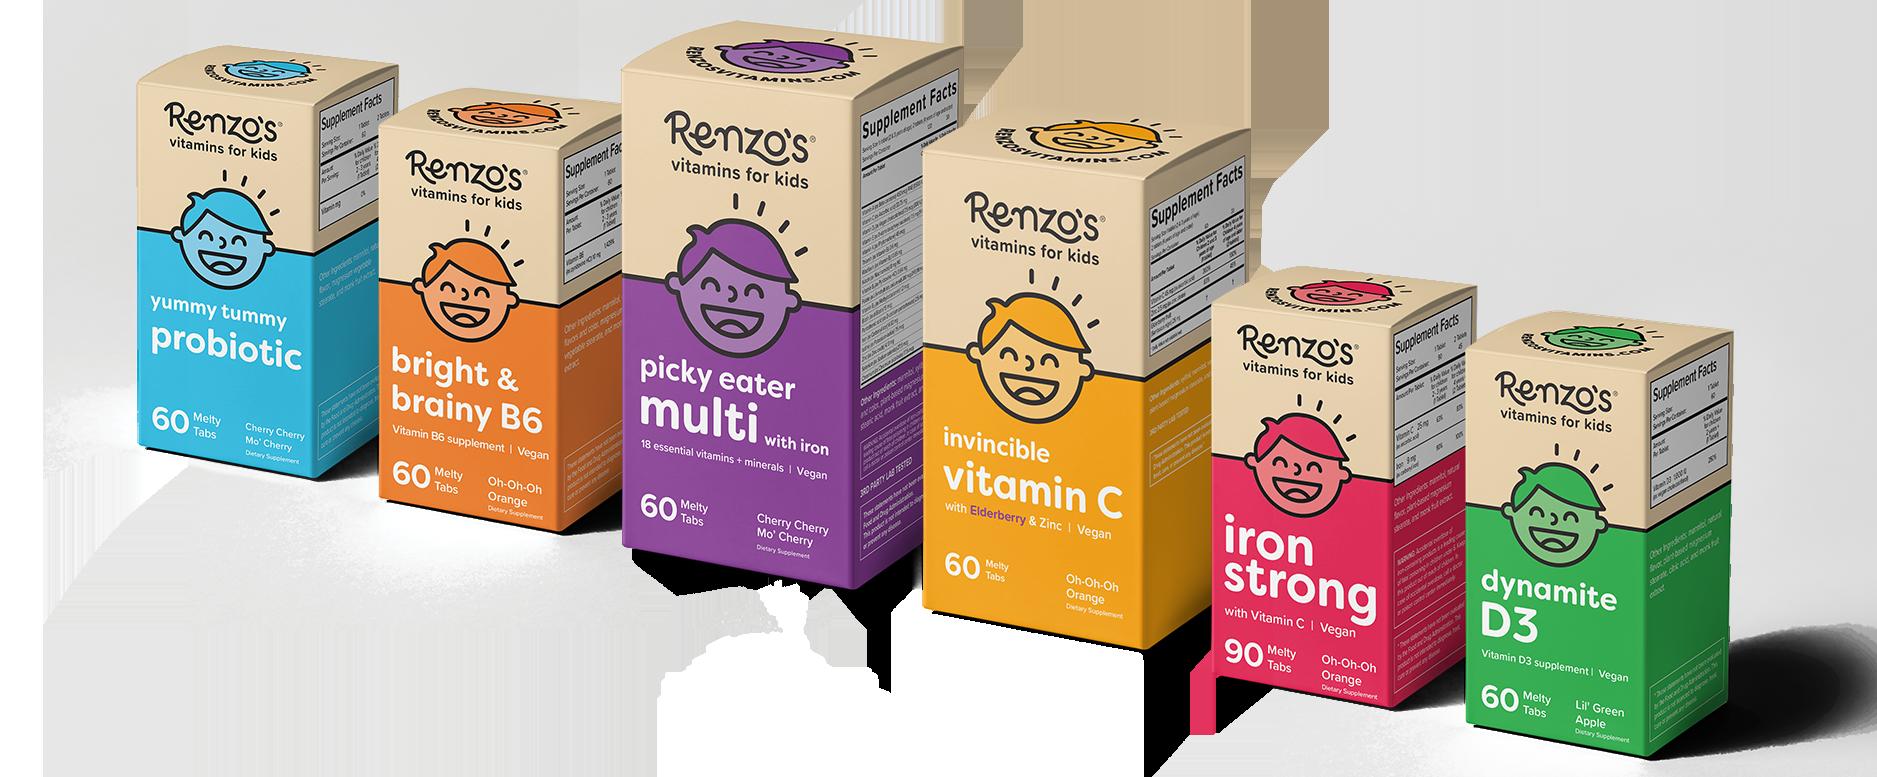 Probiotic, Vitamin B6, Multivitamin, Vitamin C, Iron, Vitamin D3